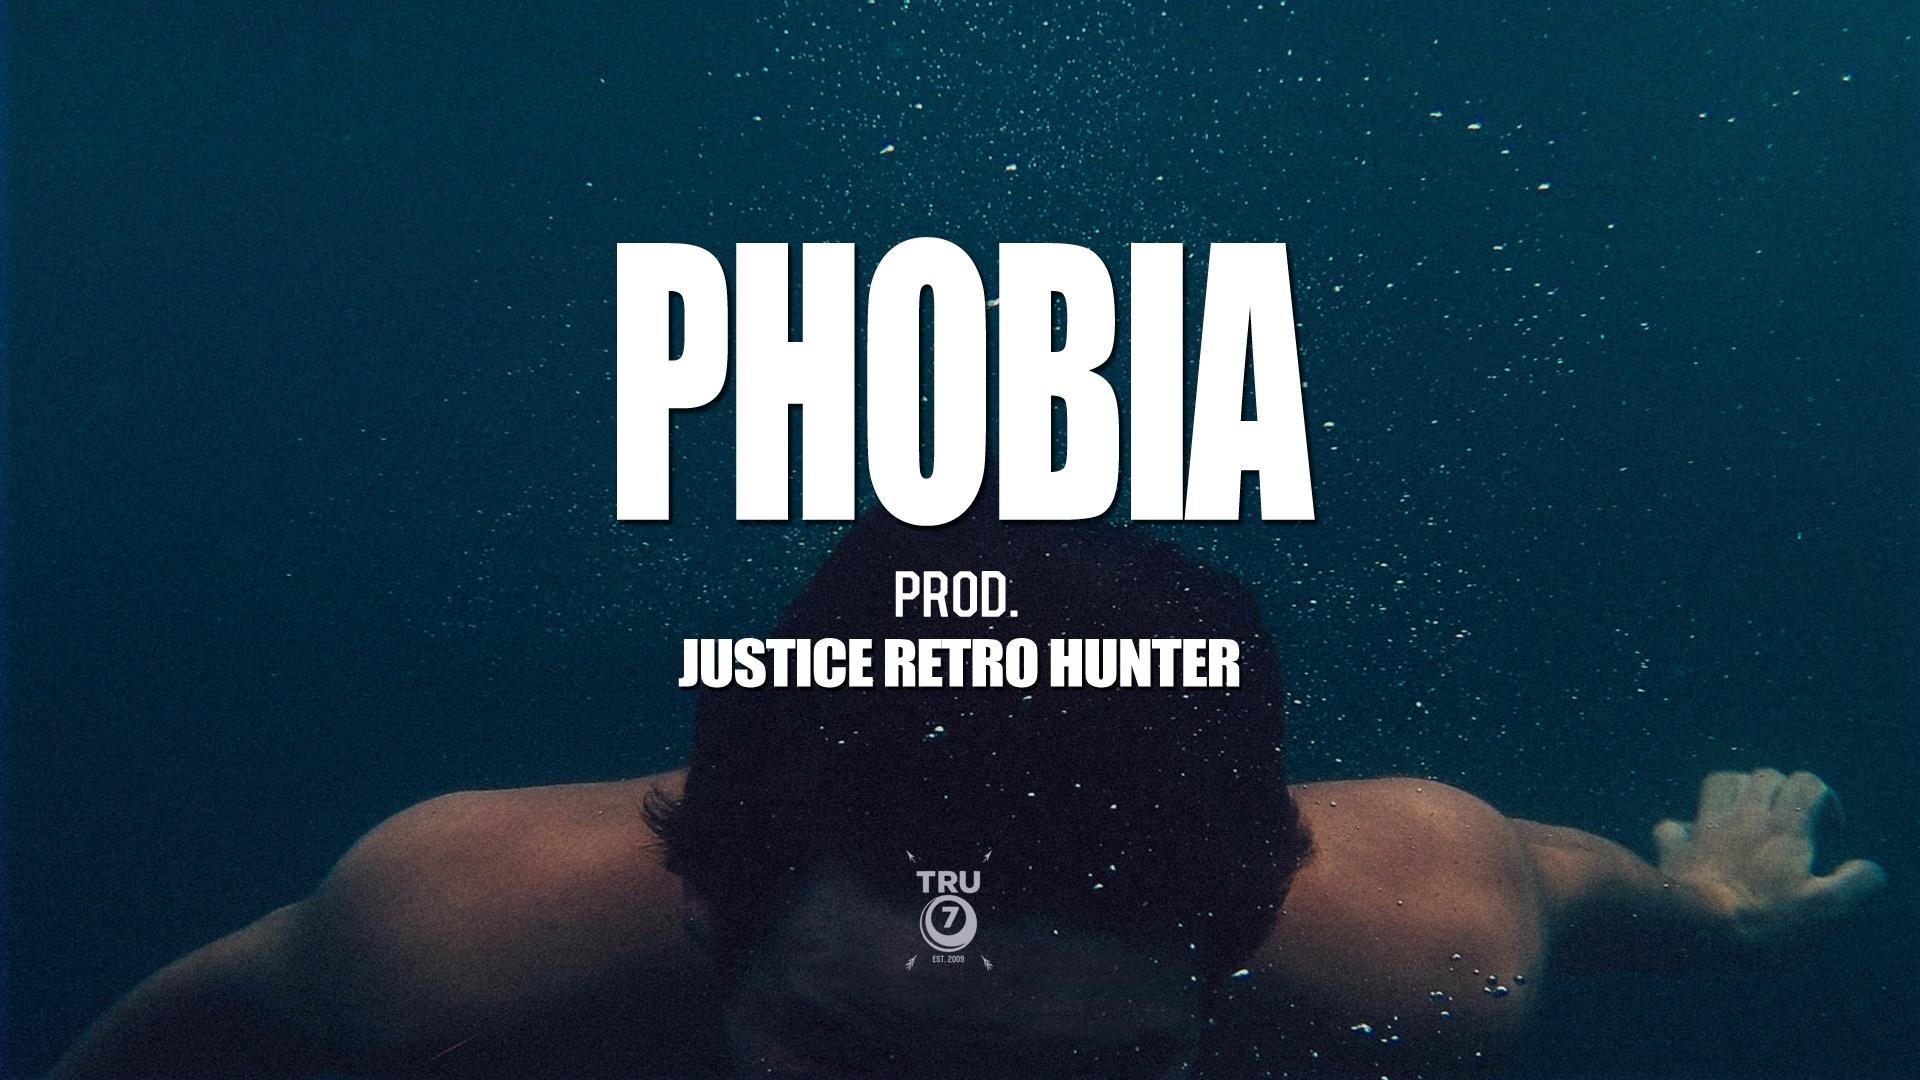 Phobia - Premium Lease Package